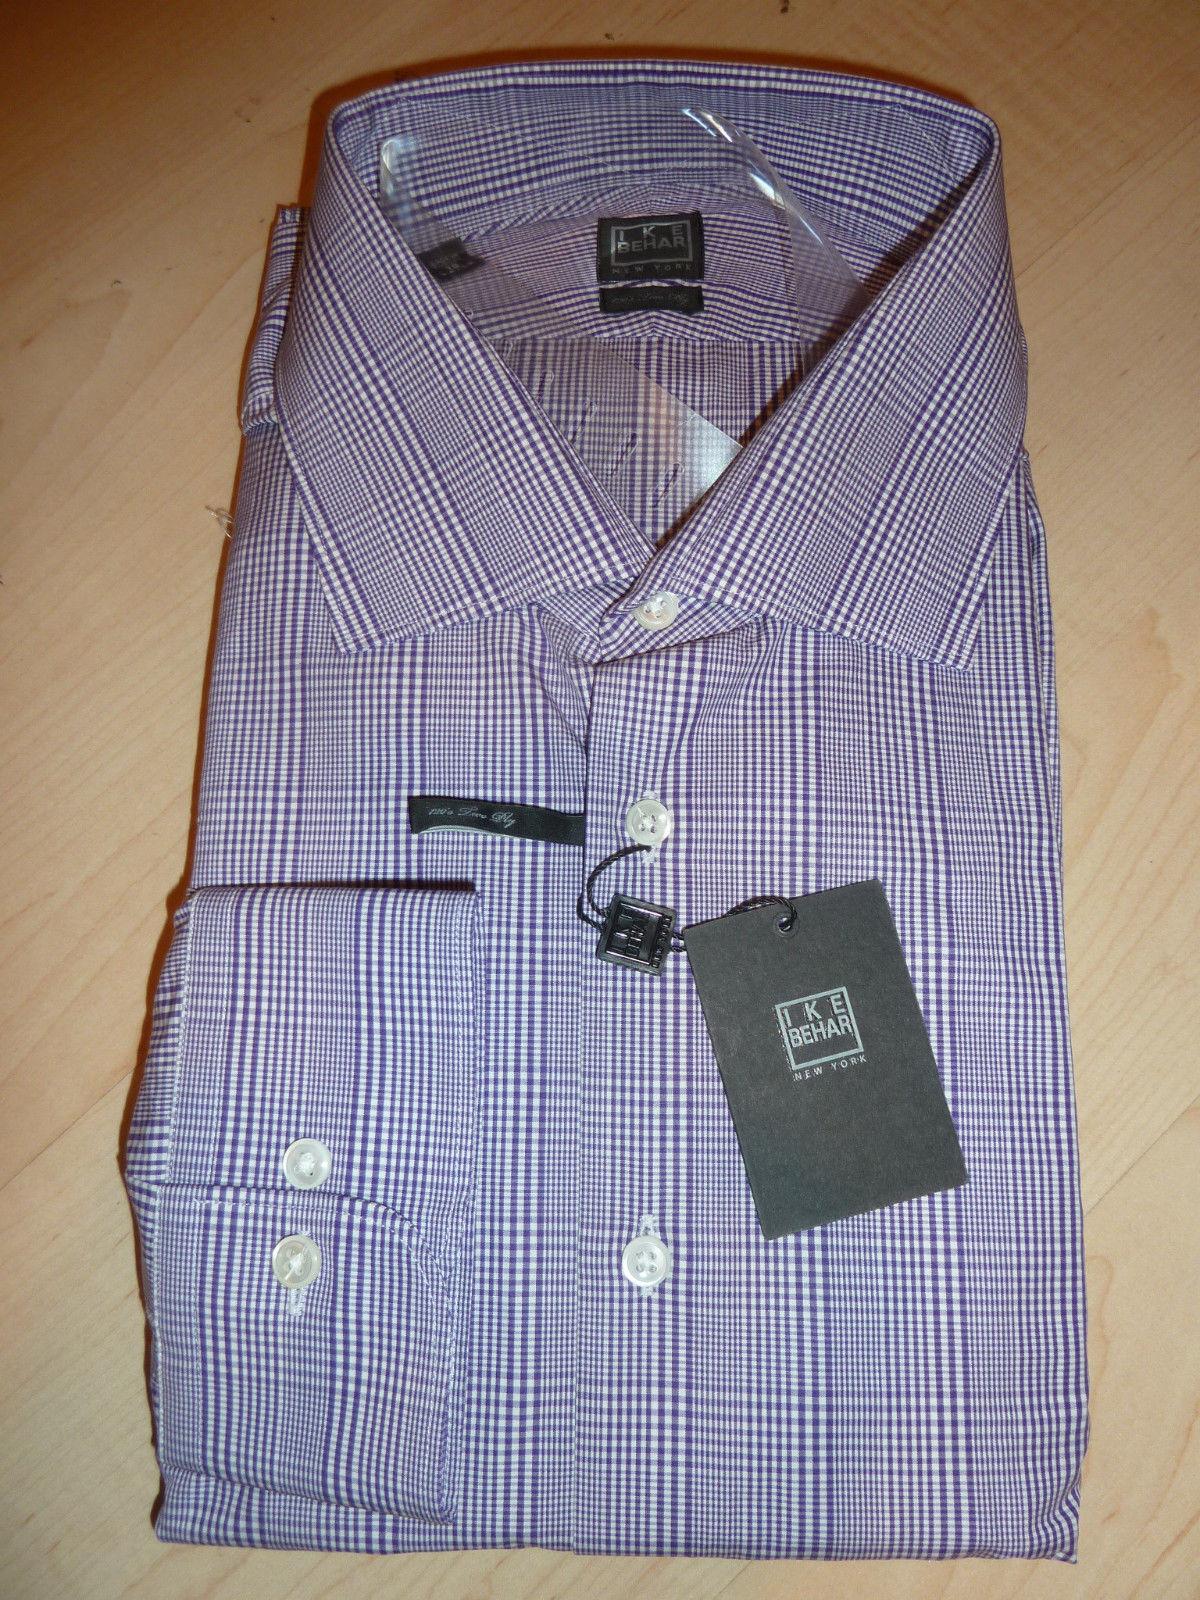 NEW  190 IKE BEHAR herren hemd Sz 15.5 34 35 120s Two Ply 100% baumwolle lila BC